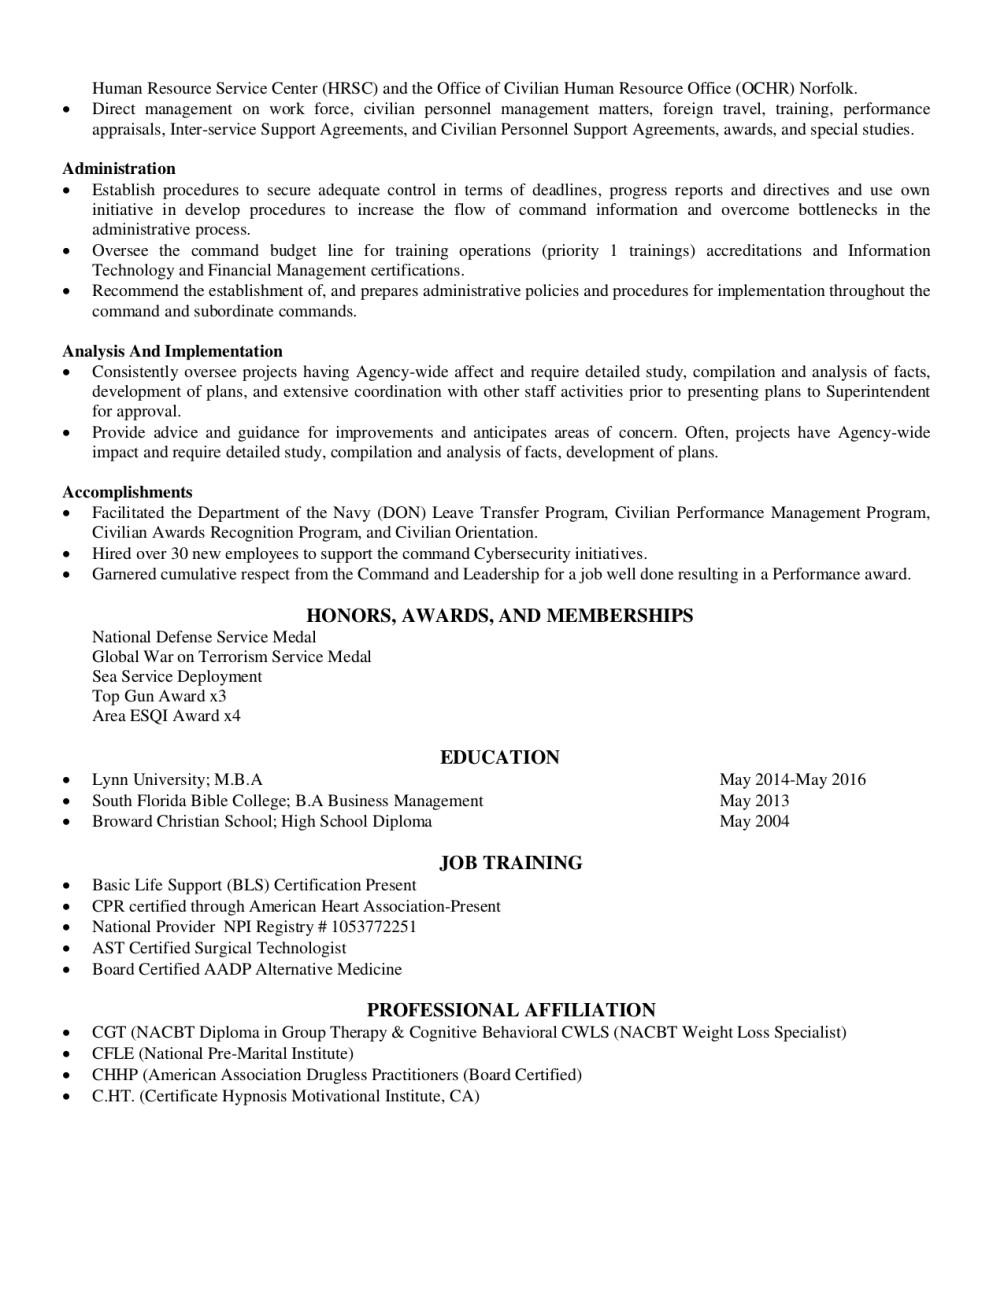 recommendation letter for travel agency - Emayti